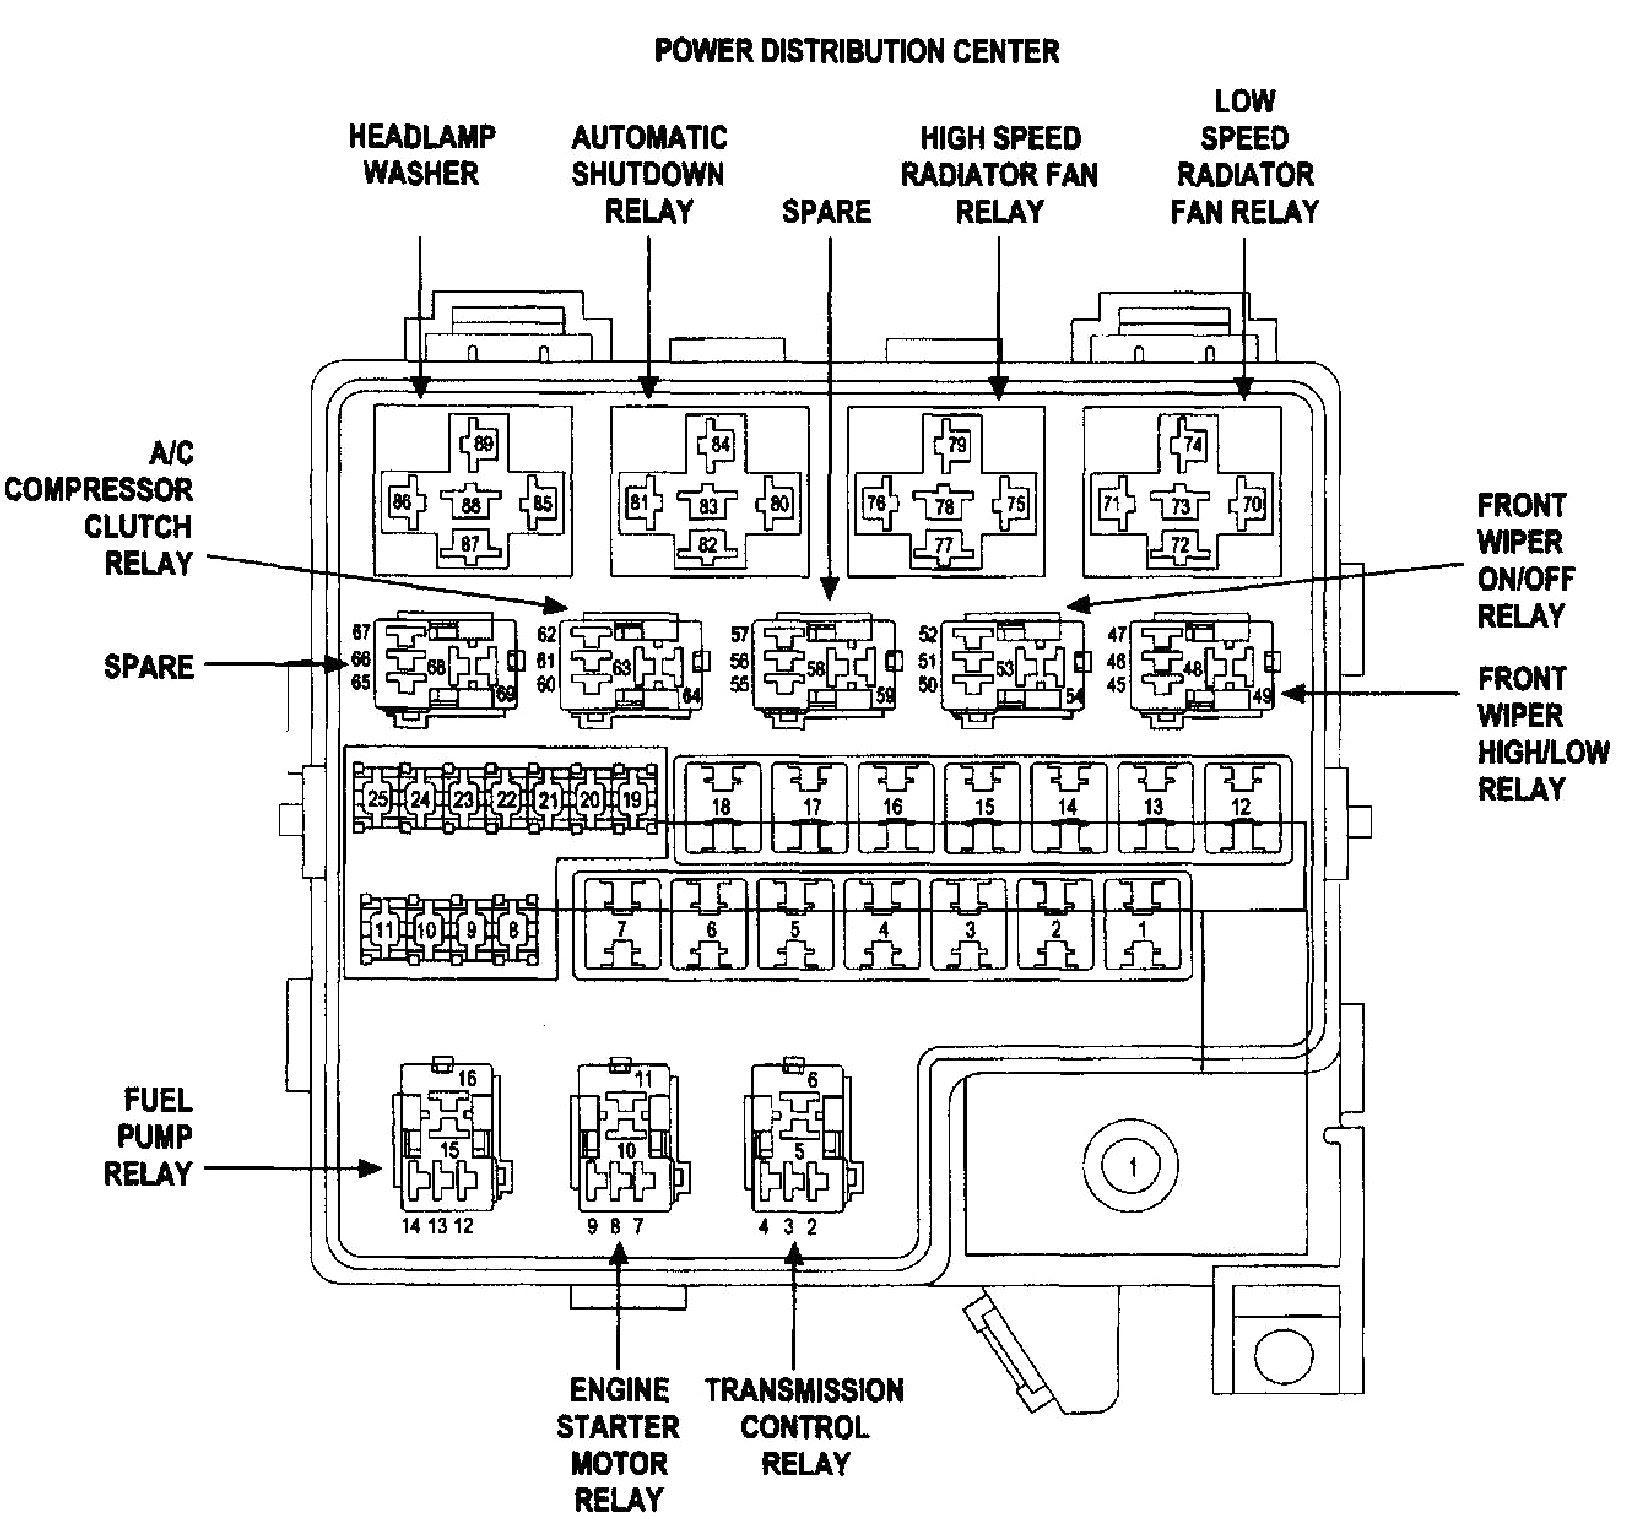 Wiring Diagram Pdf  2003 Dodge Stratus Fuse Box Under Hood